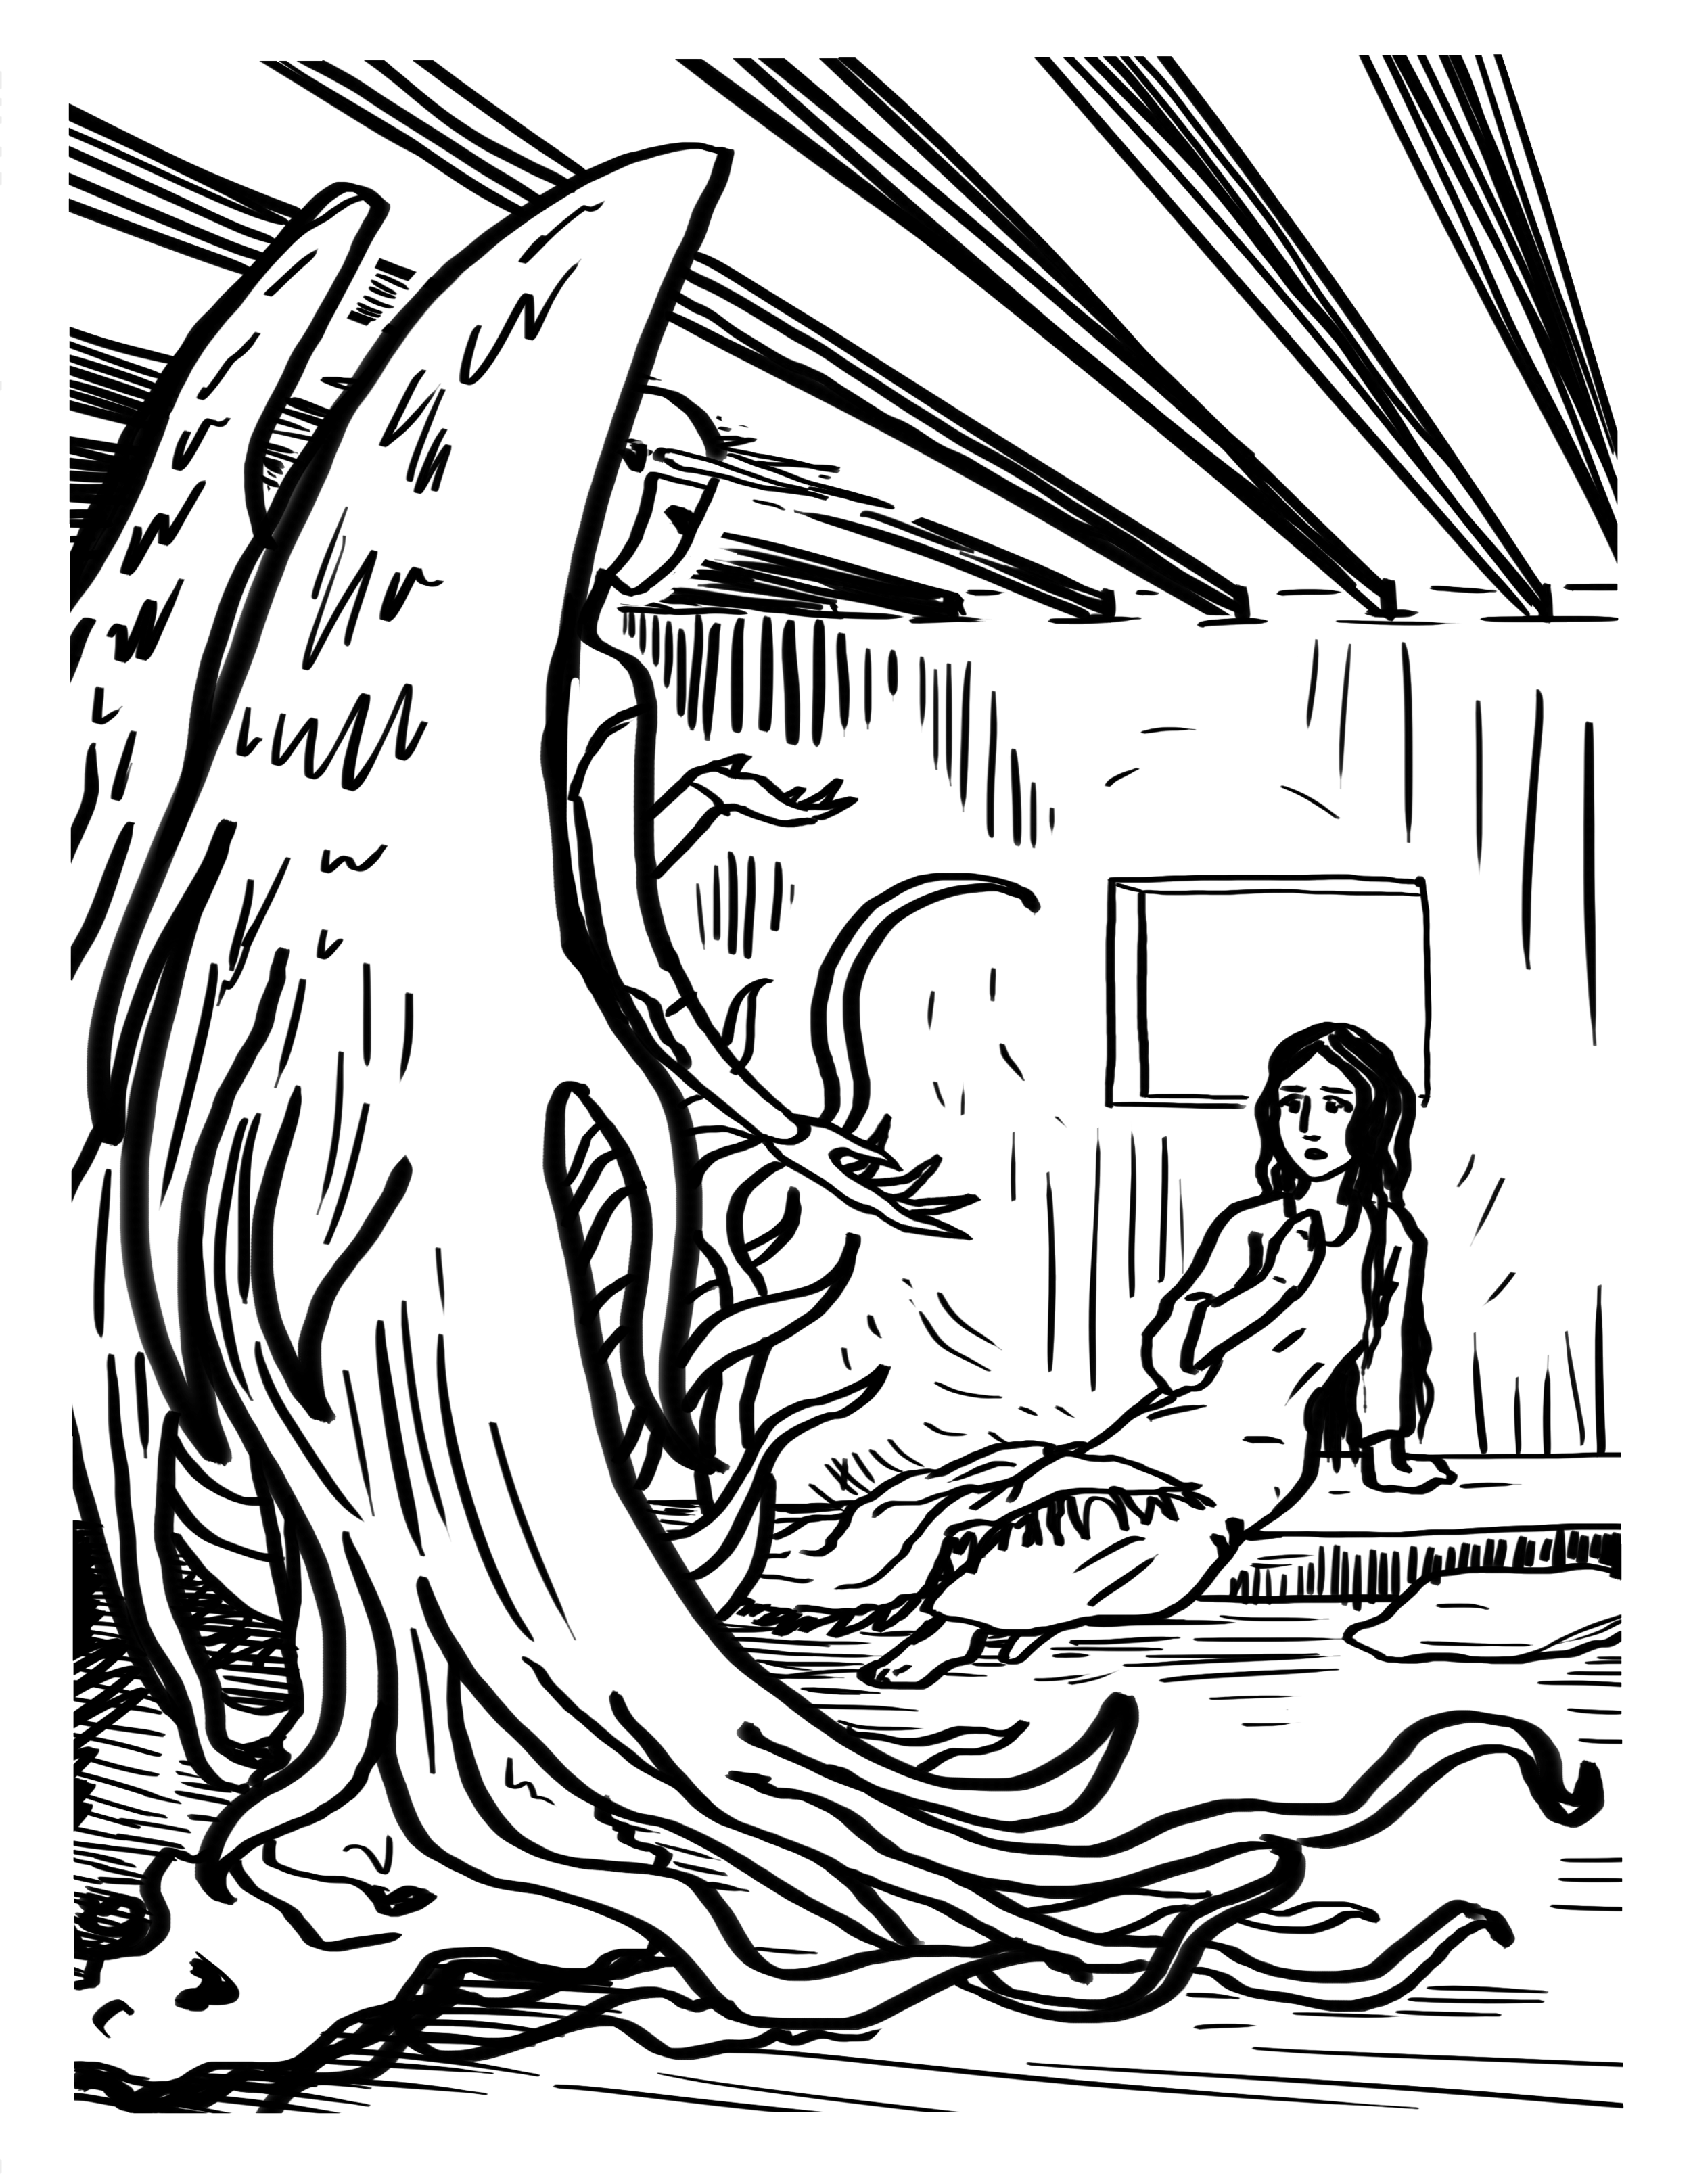 Lent-Illustrations-ColoringArtboard-1.png